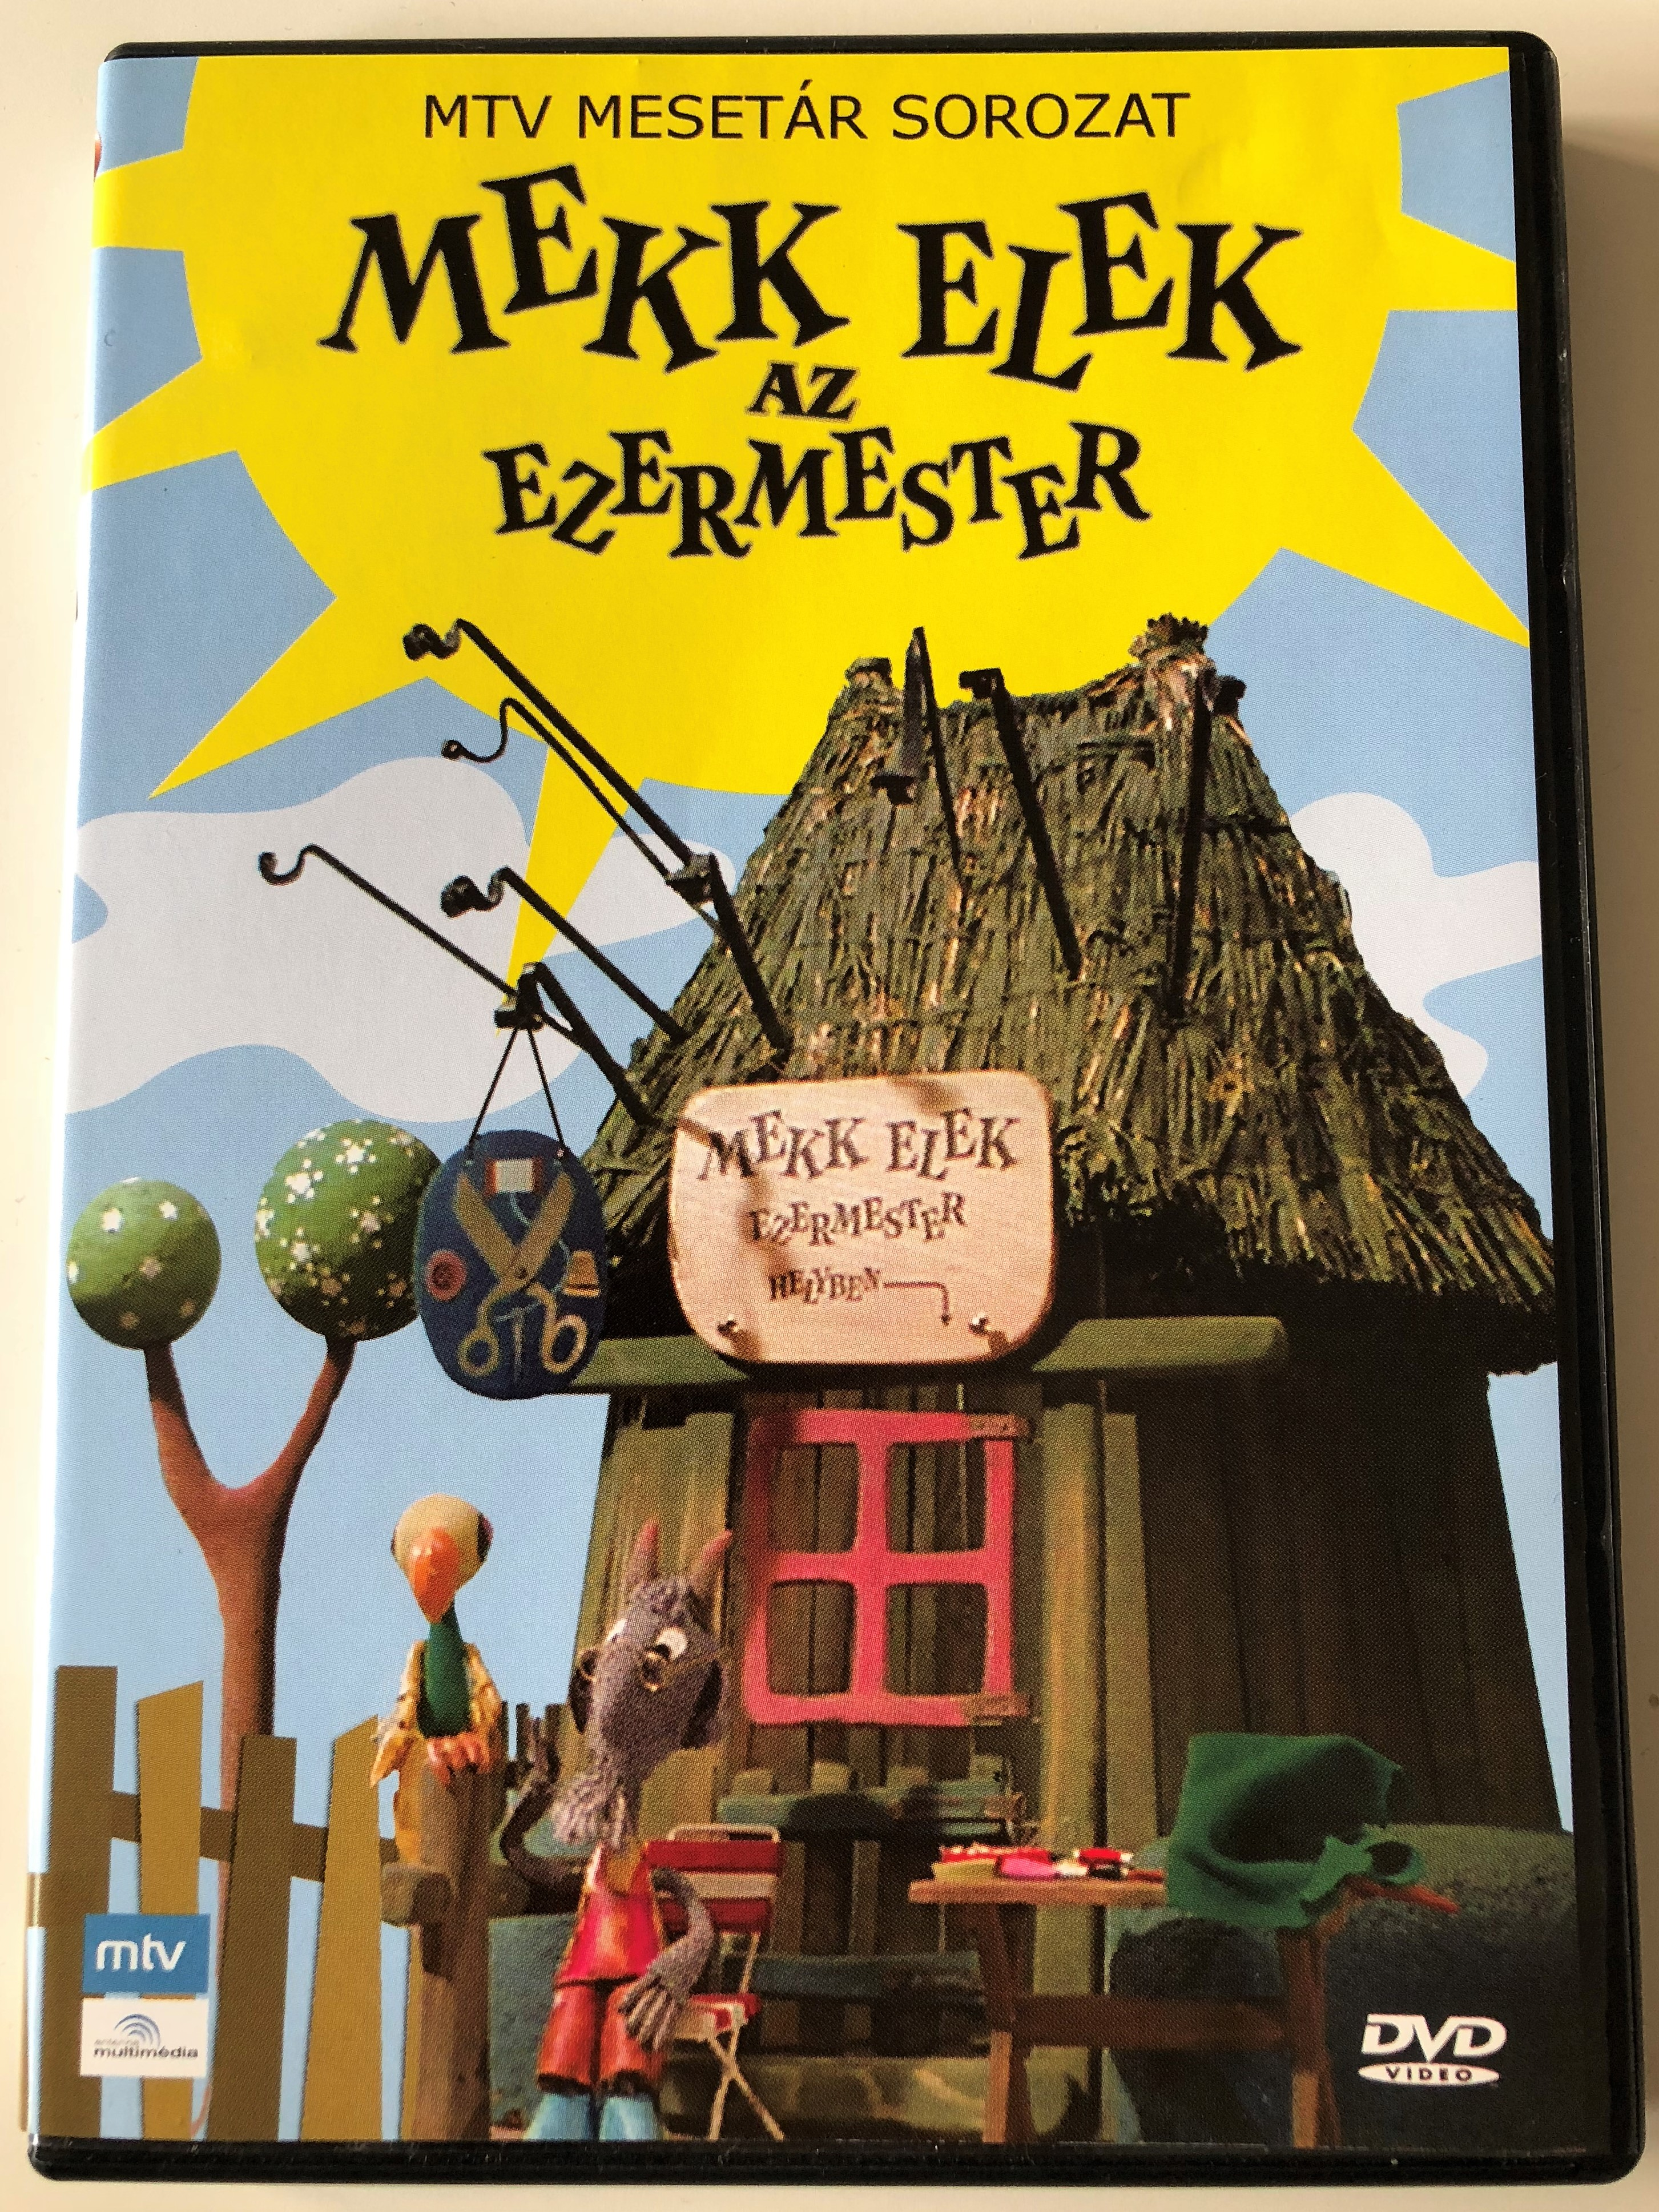 mekk-elek-az-ezermester-dvd-1980-elek-mekk-the-handyman-directed-by-imre-istv-n-story-by-romh-nyi-j-zsef-1-.jpg